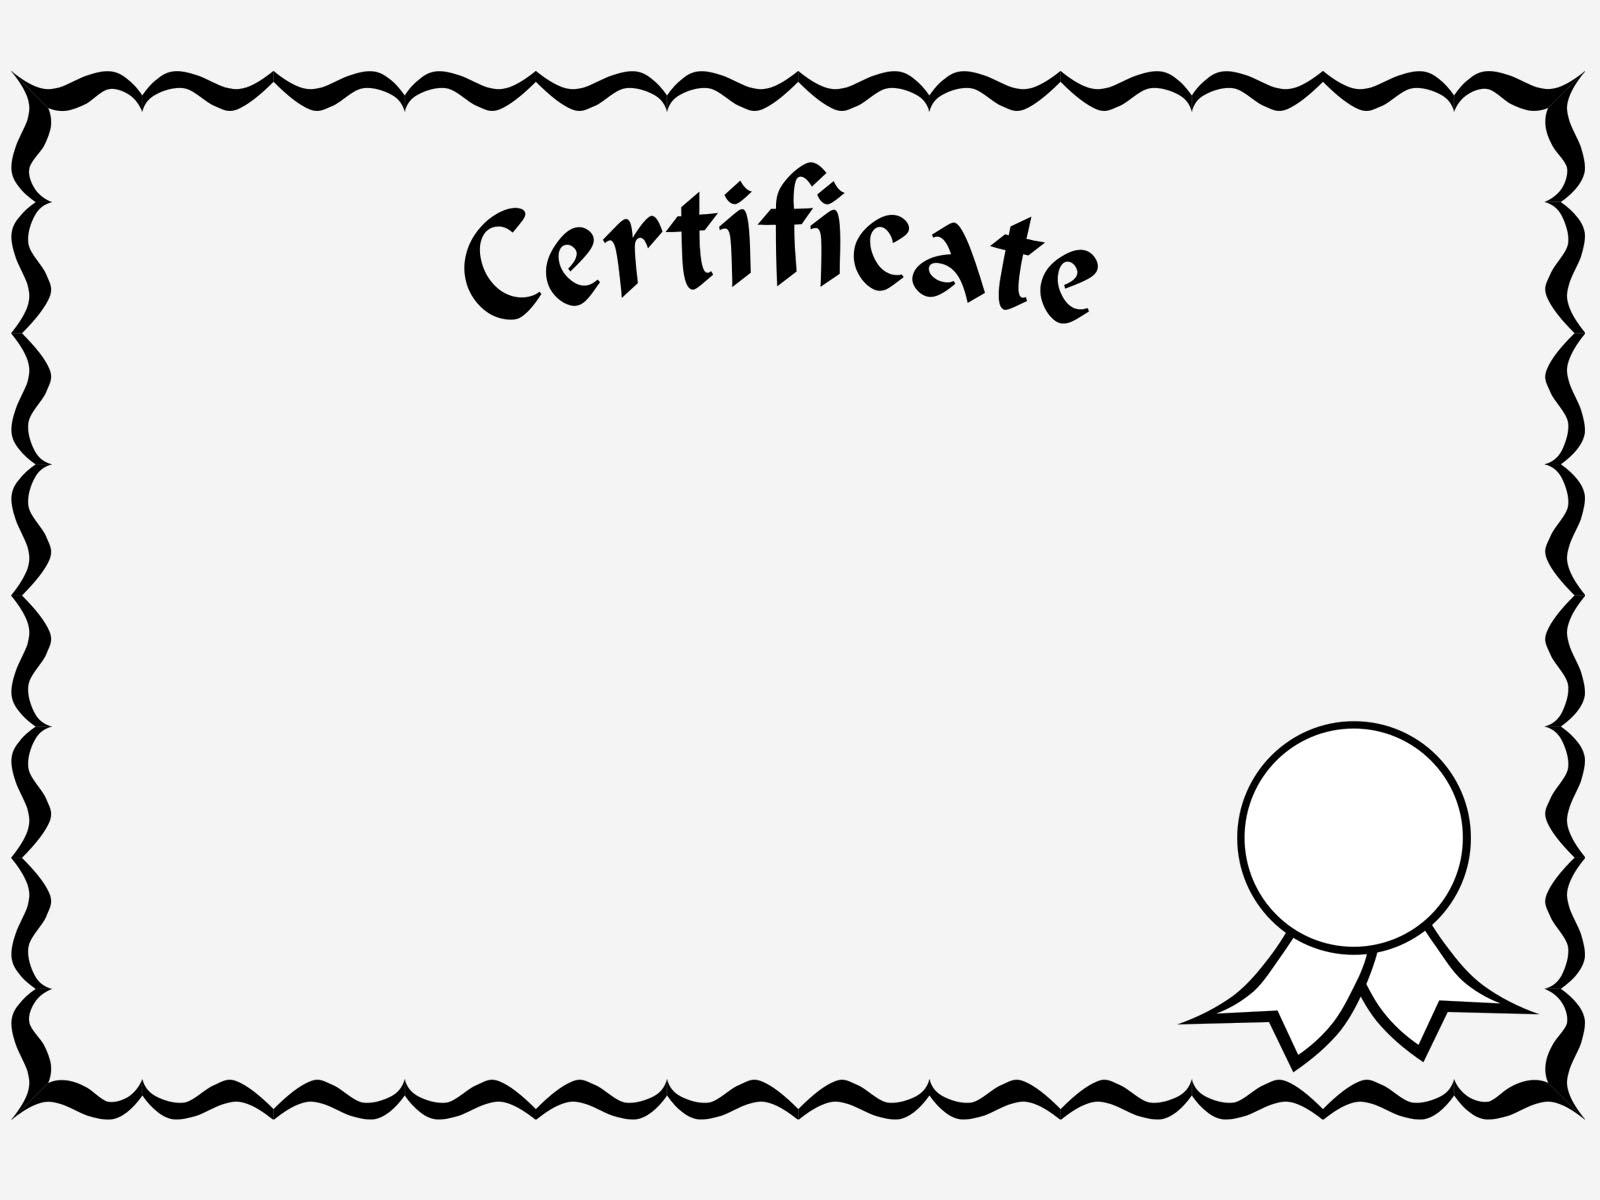 Certificate hen clipart